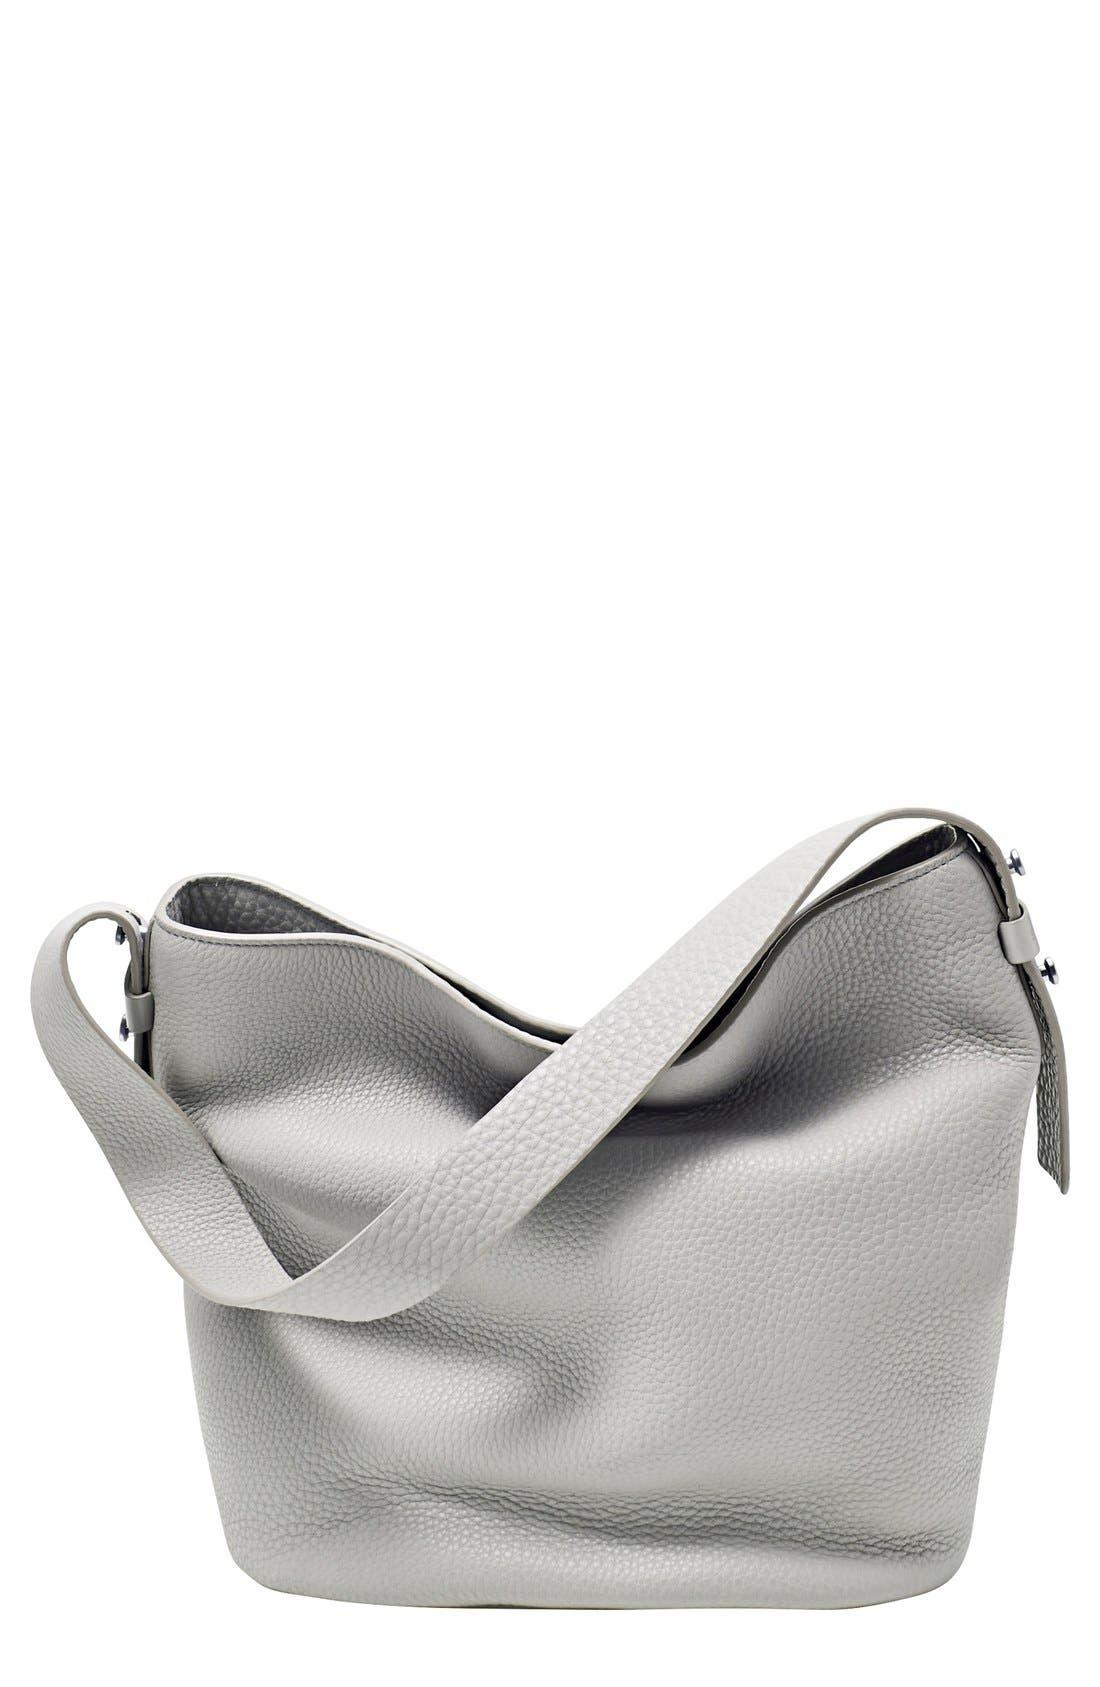 Alternate Image 1 Selected - Skagen 'Karyn' Mini Bucket Bag